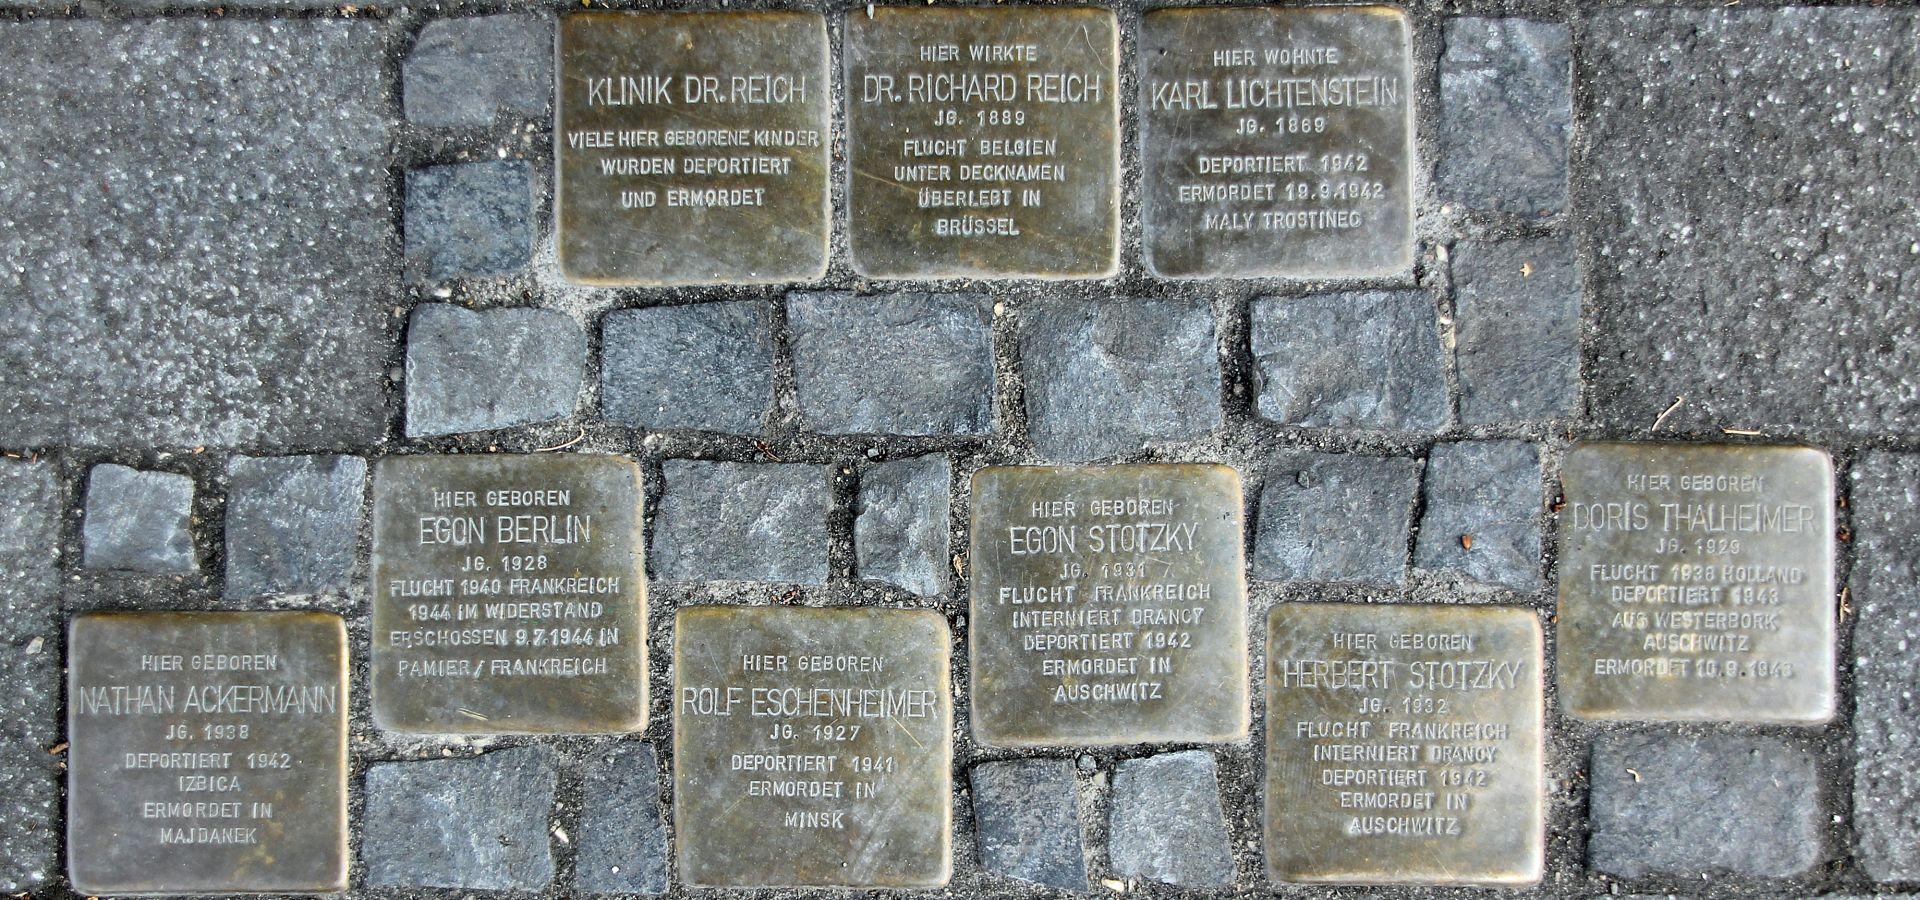 stolpersteine - memorial to the victims of Nazi regime